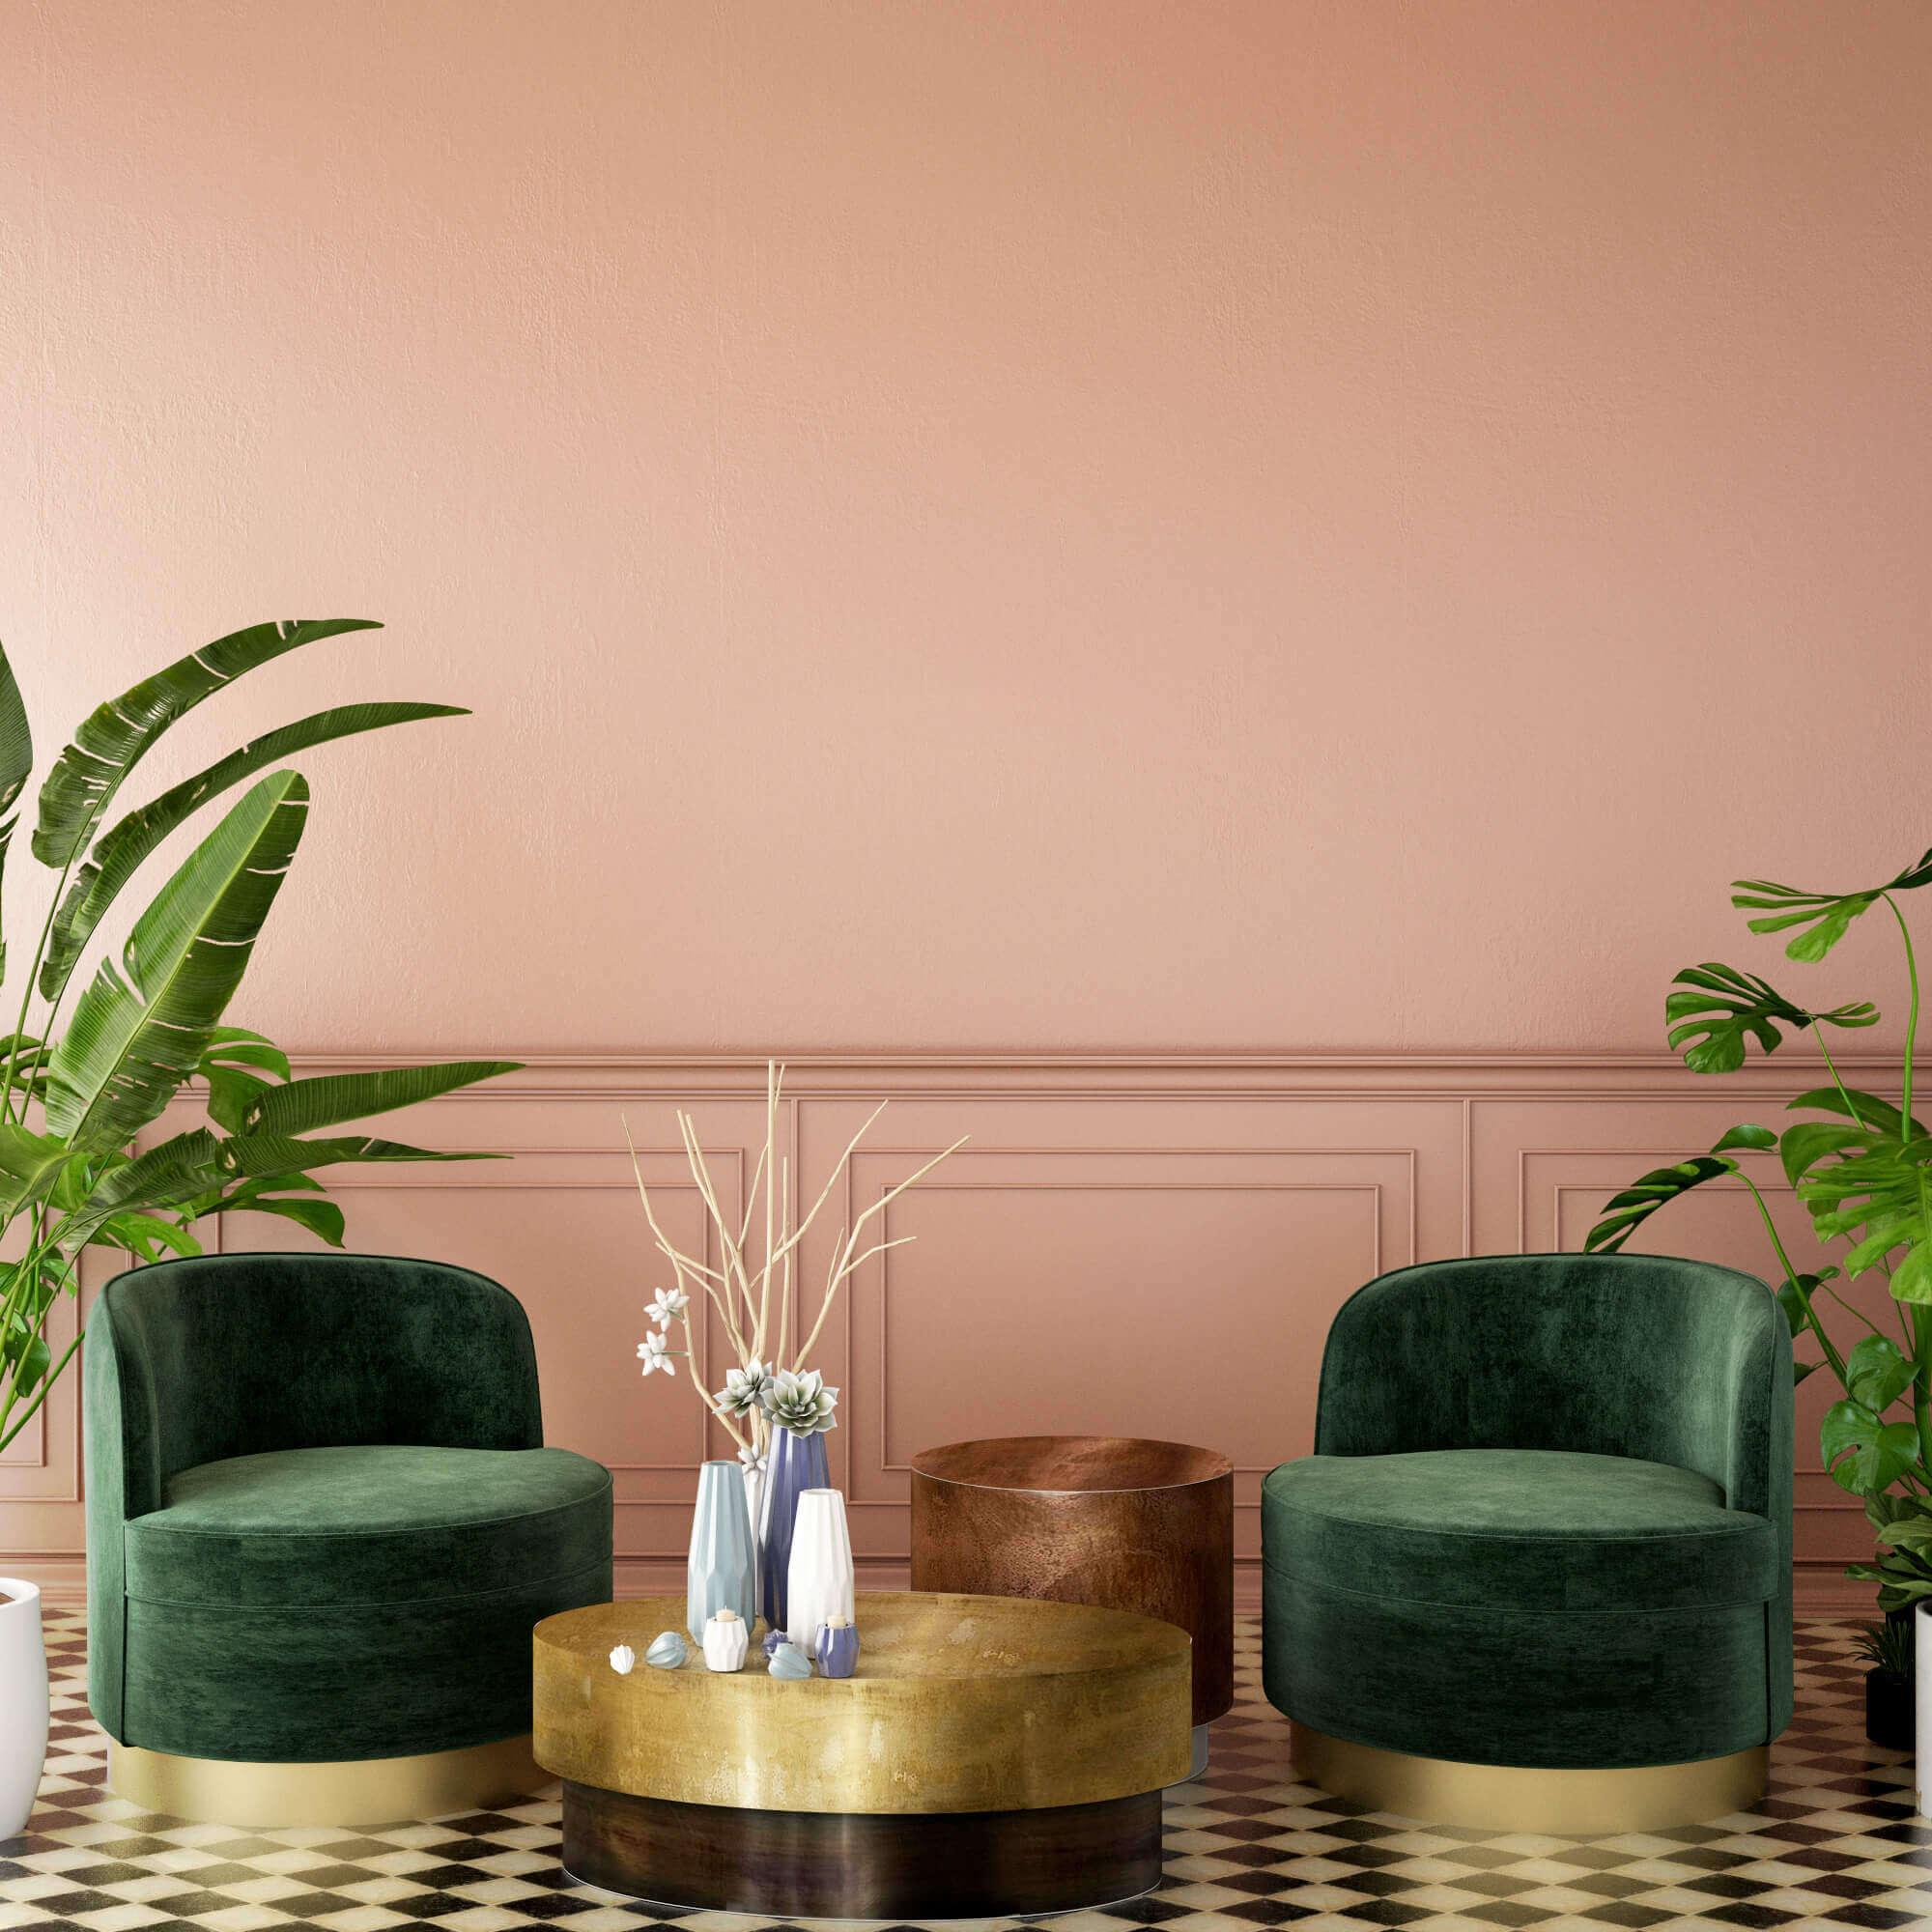 Peach & Green Living Room Interior Concept